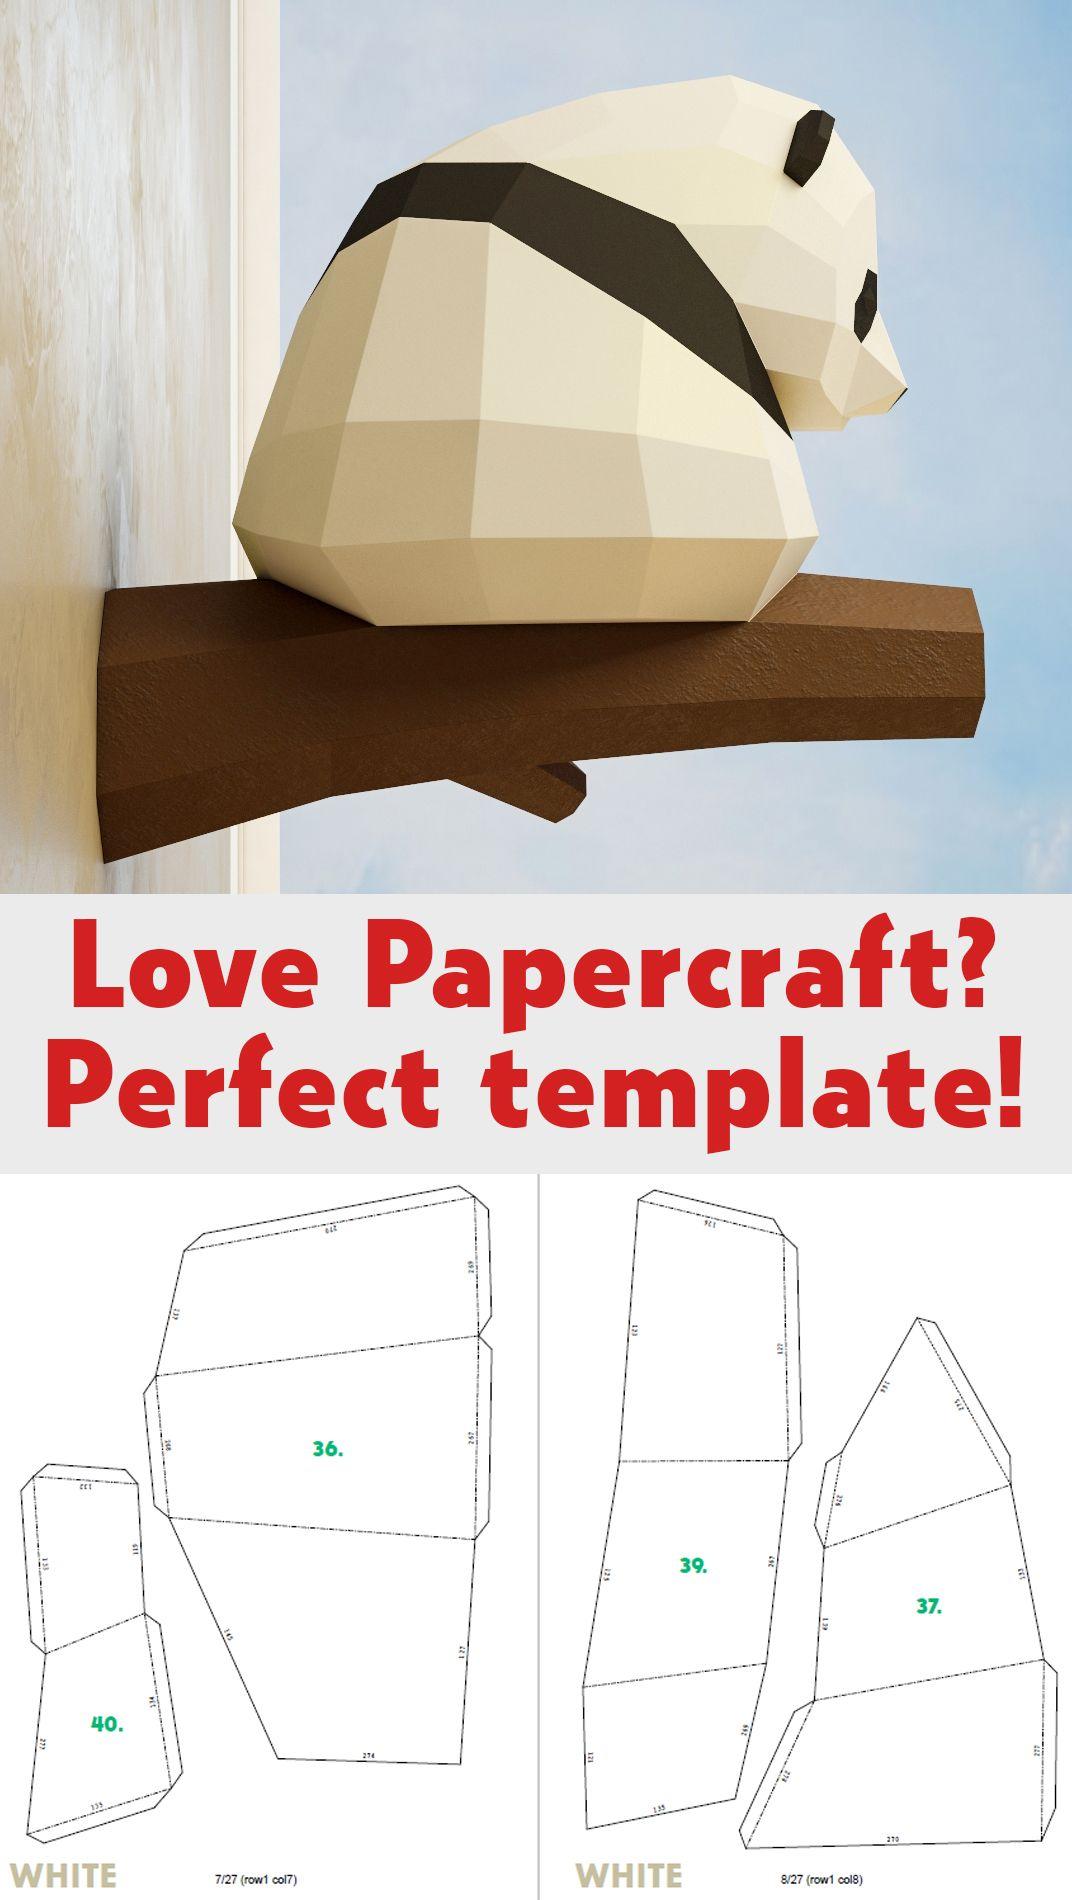 Papercraft Little Panda DIY Paper craft 3D template PDF kit make